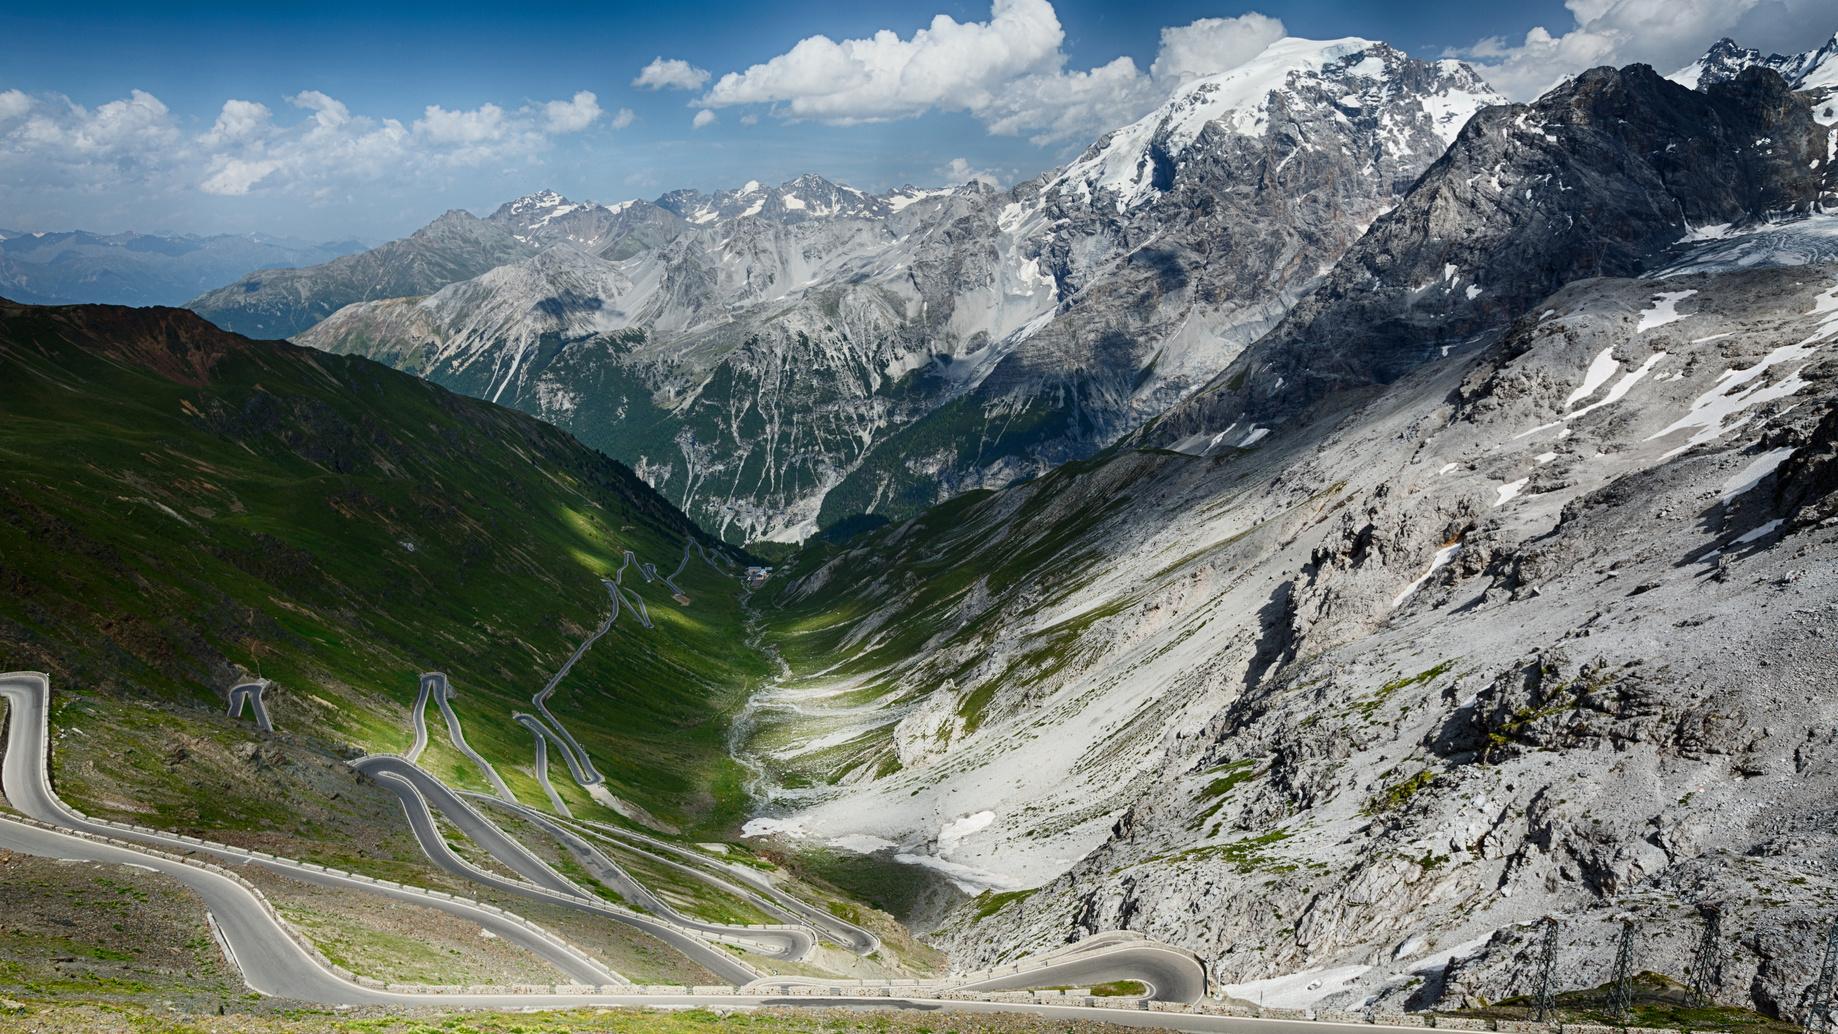 Driving A Rental Car In Switzerland